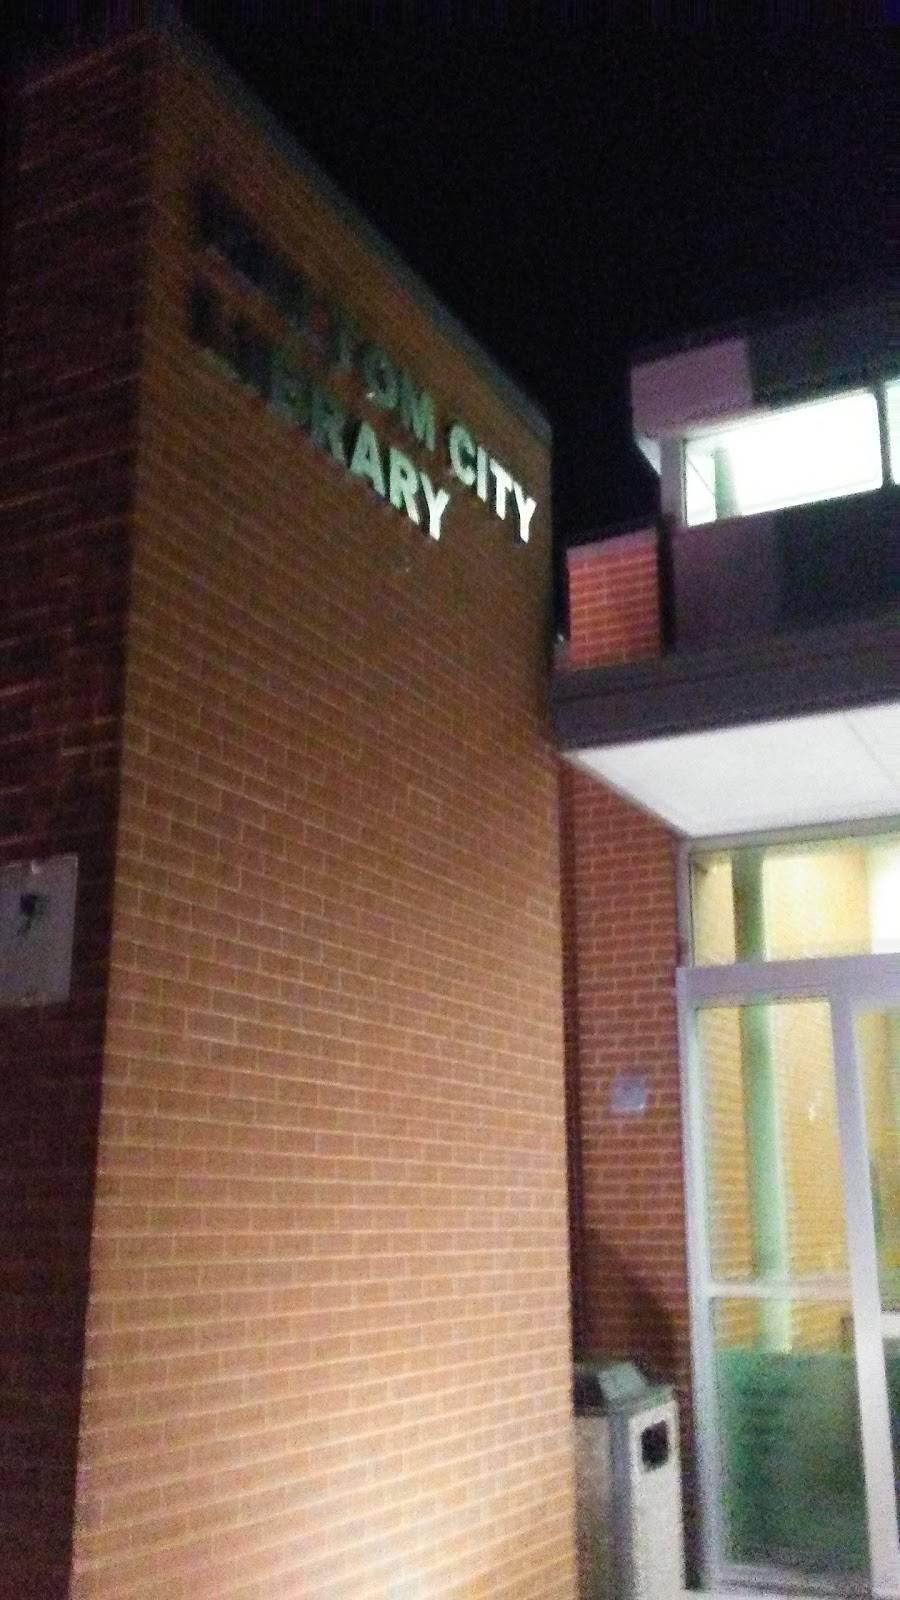 Haltom City Public Library - library  | Photo 9 of 9 | Address: 4809 Haltom Rd, Haltom City, TX 76117, USA | Phone: (817) 222-7786